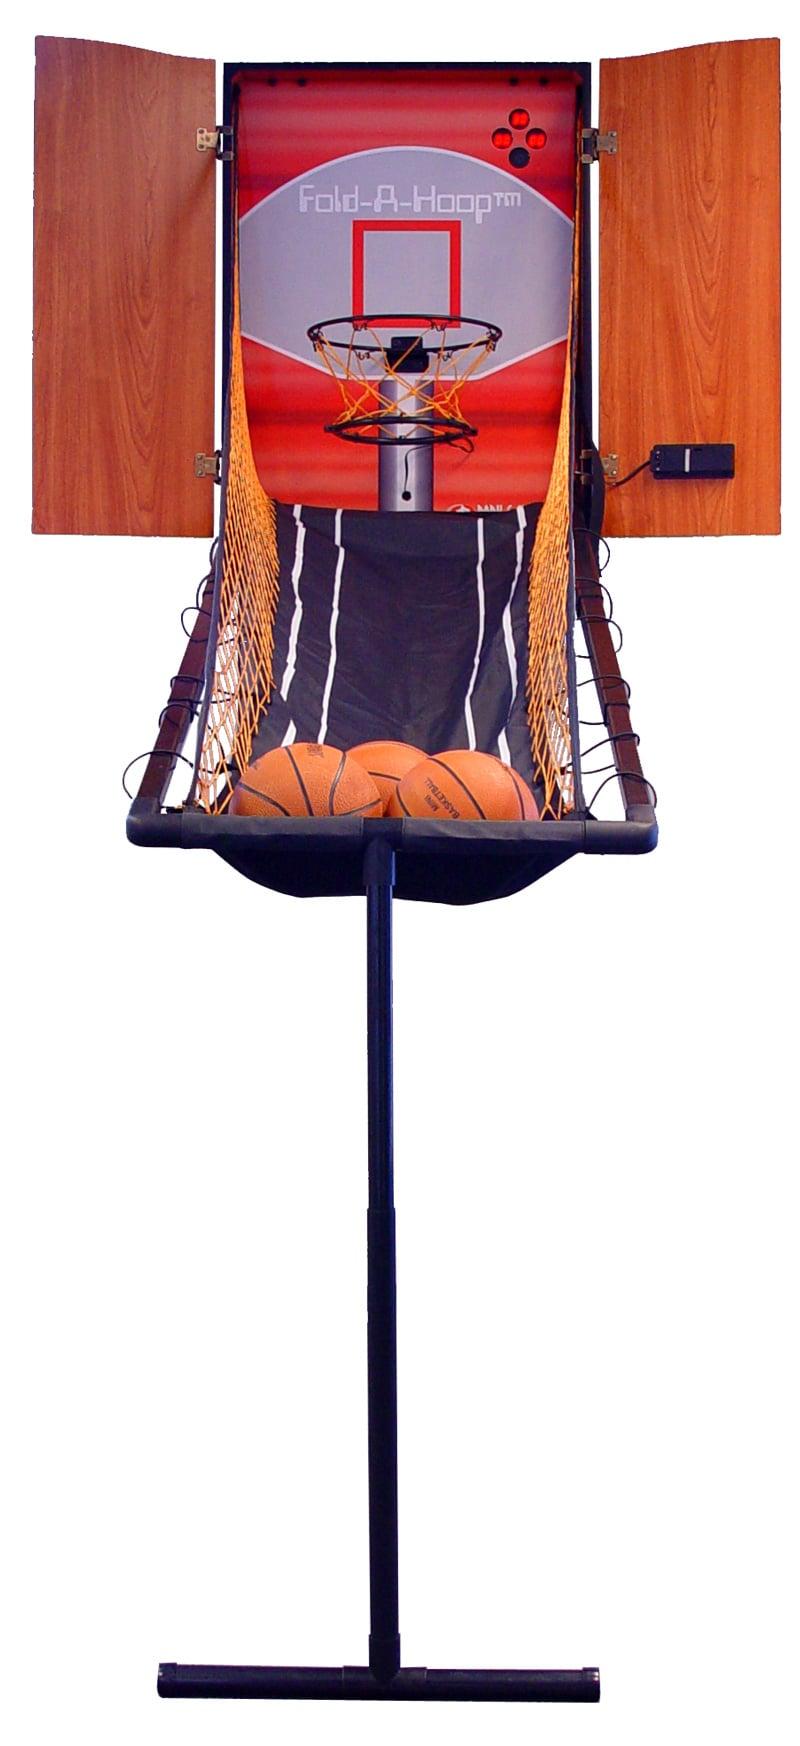 Fold-A-Hoop 2Player Arcade Basketball Game